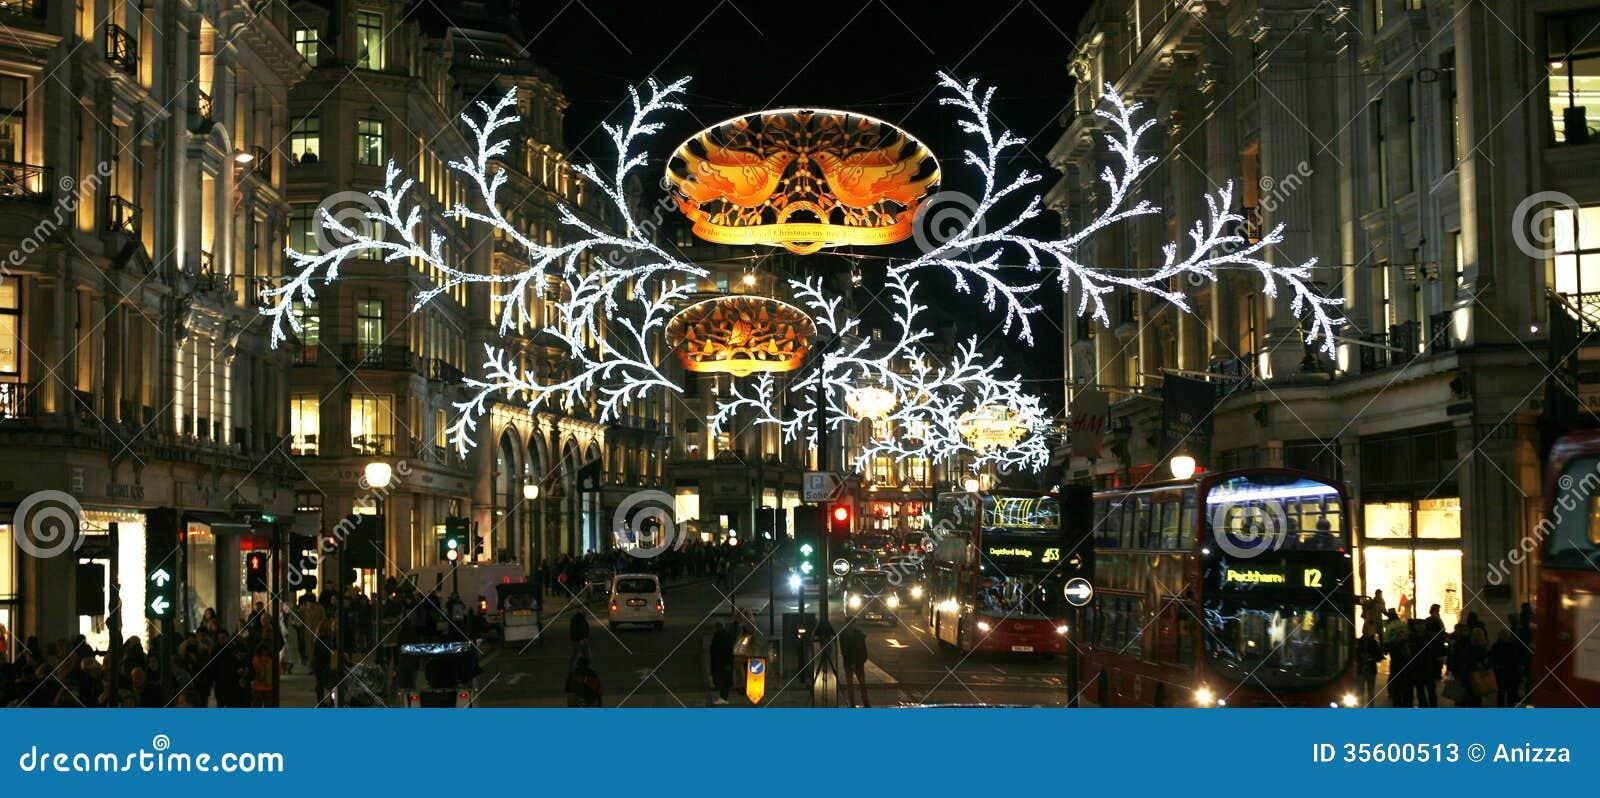 Outdoor Lights Christmas Decoration